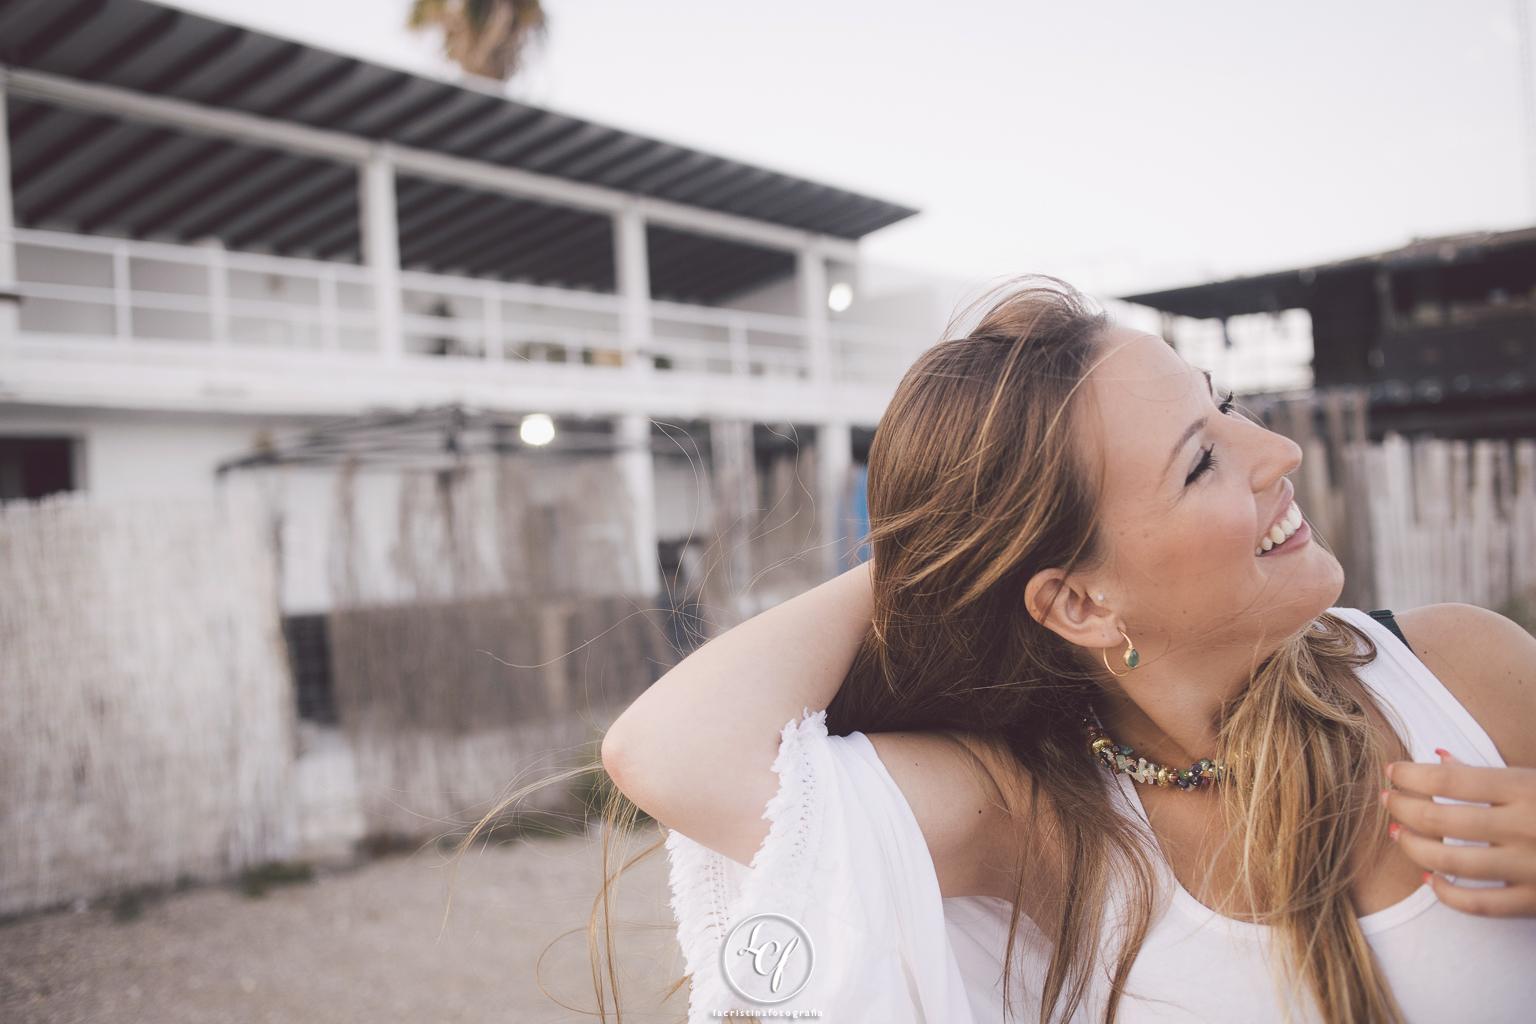 fotografo familiar :: fotografía familiar :: fotógrafa familiar :: fotografía familiar sitges :: fotografía hotel dolce :: fotografía familiar playa